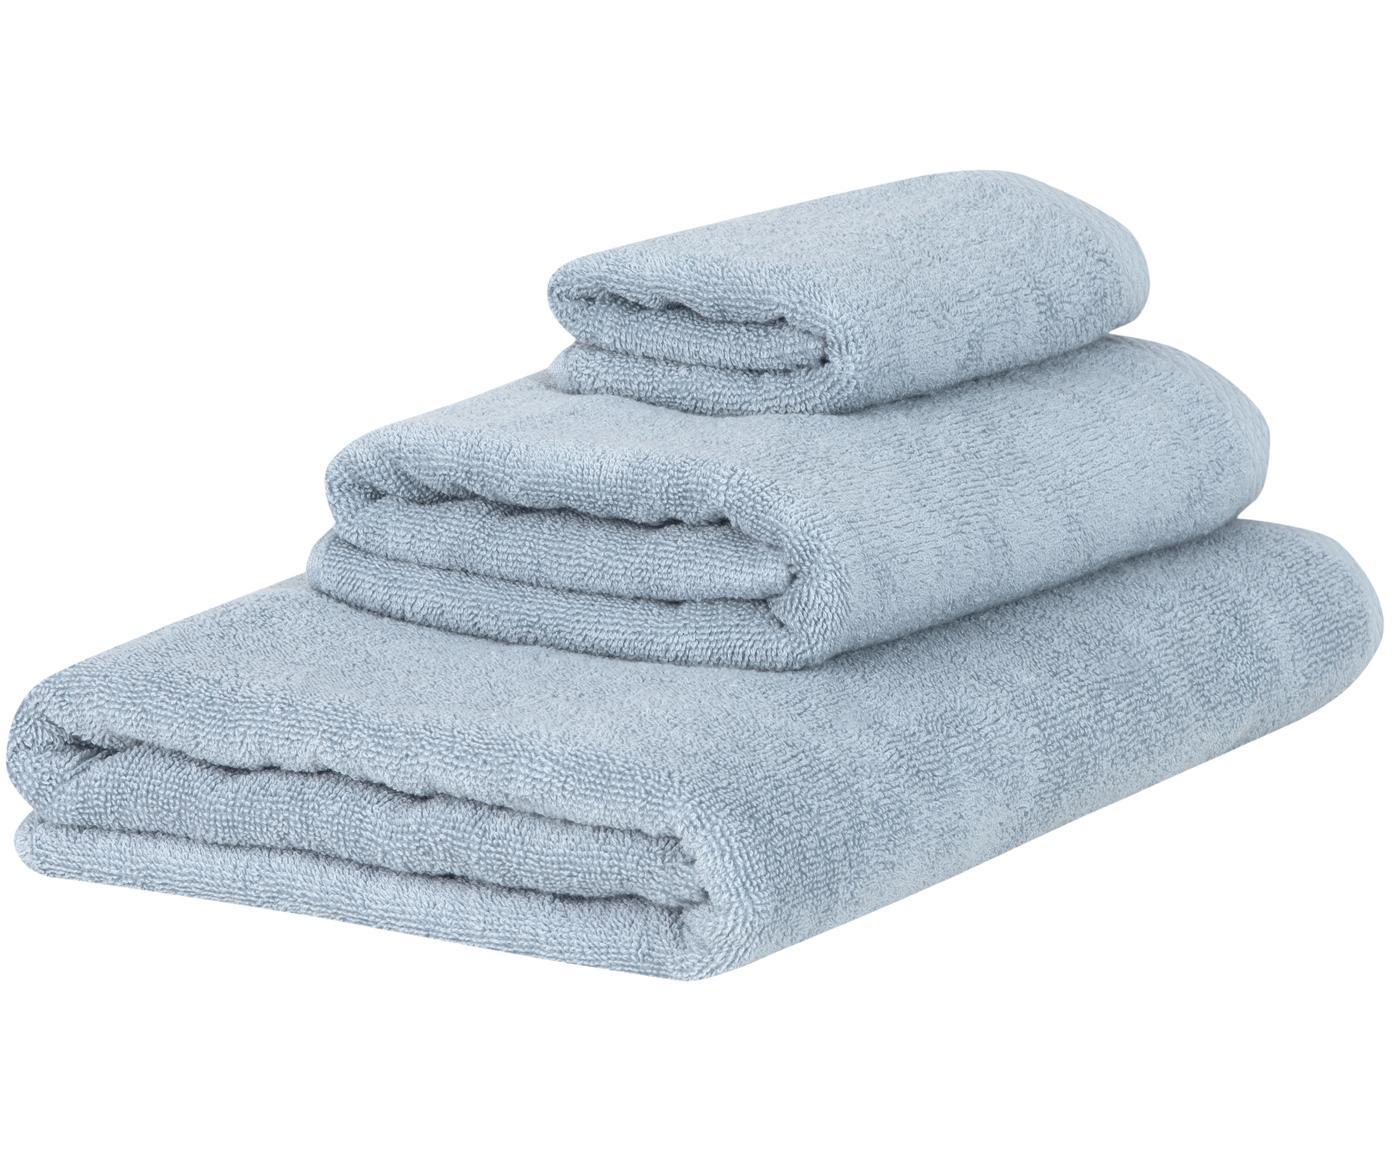 Set de toallas Comfort, 3pzas., Azul claro, Tamaños diferentes